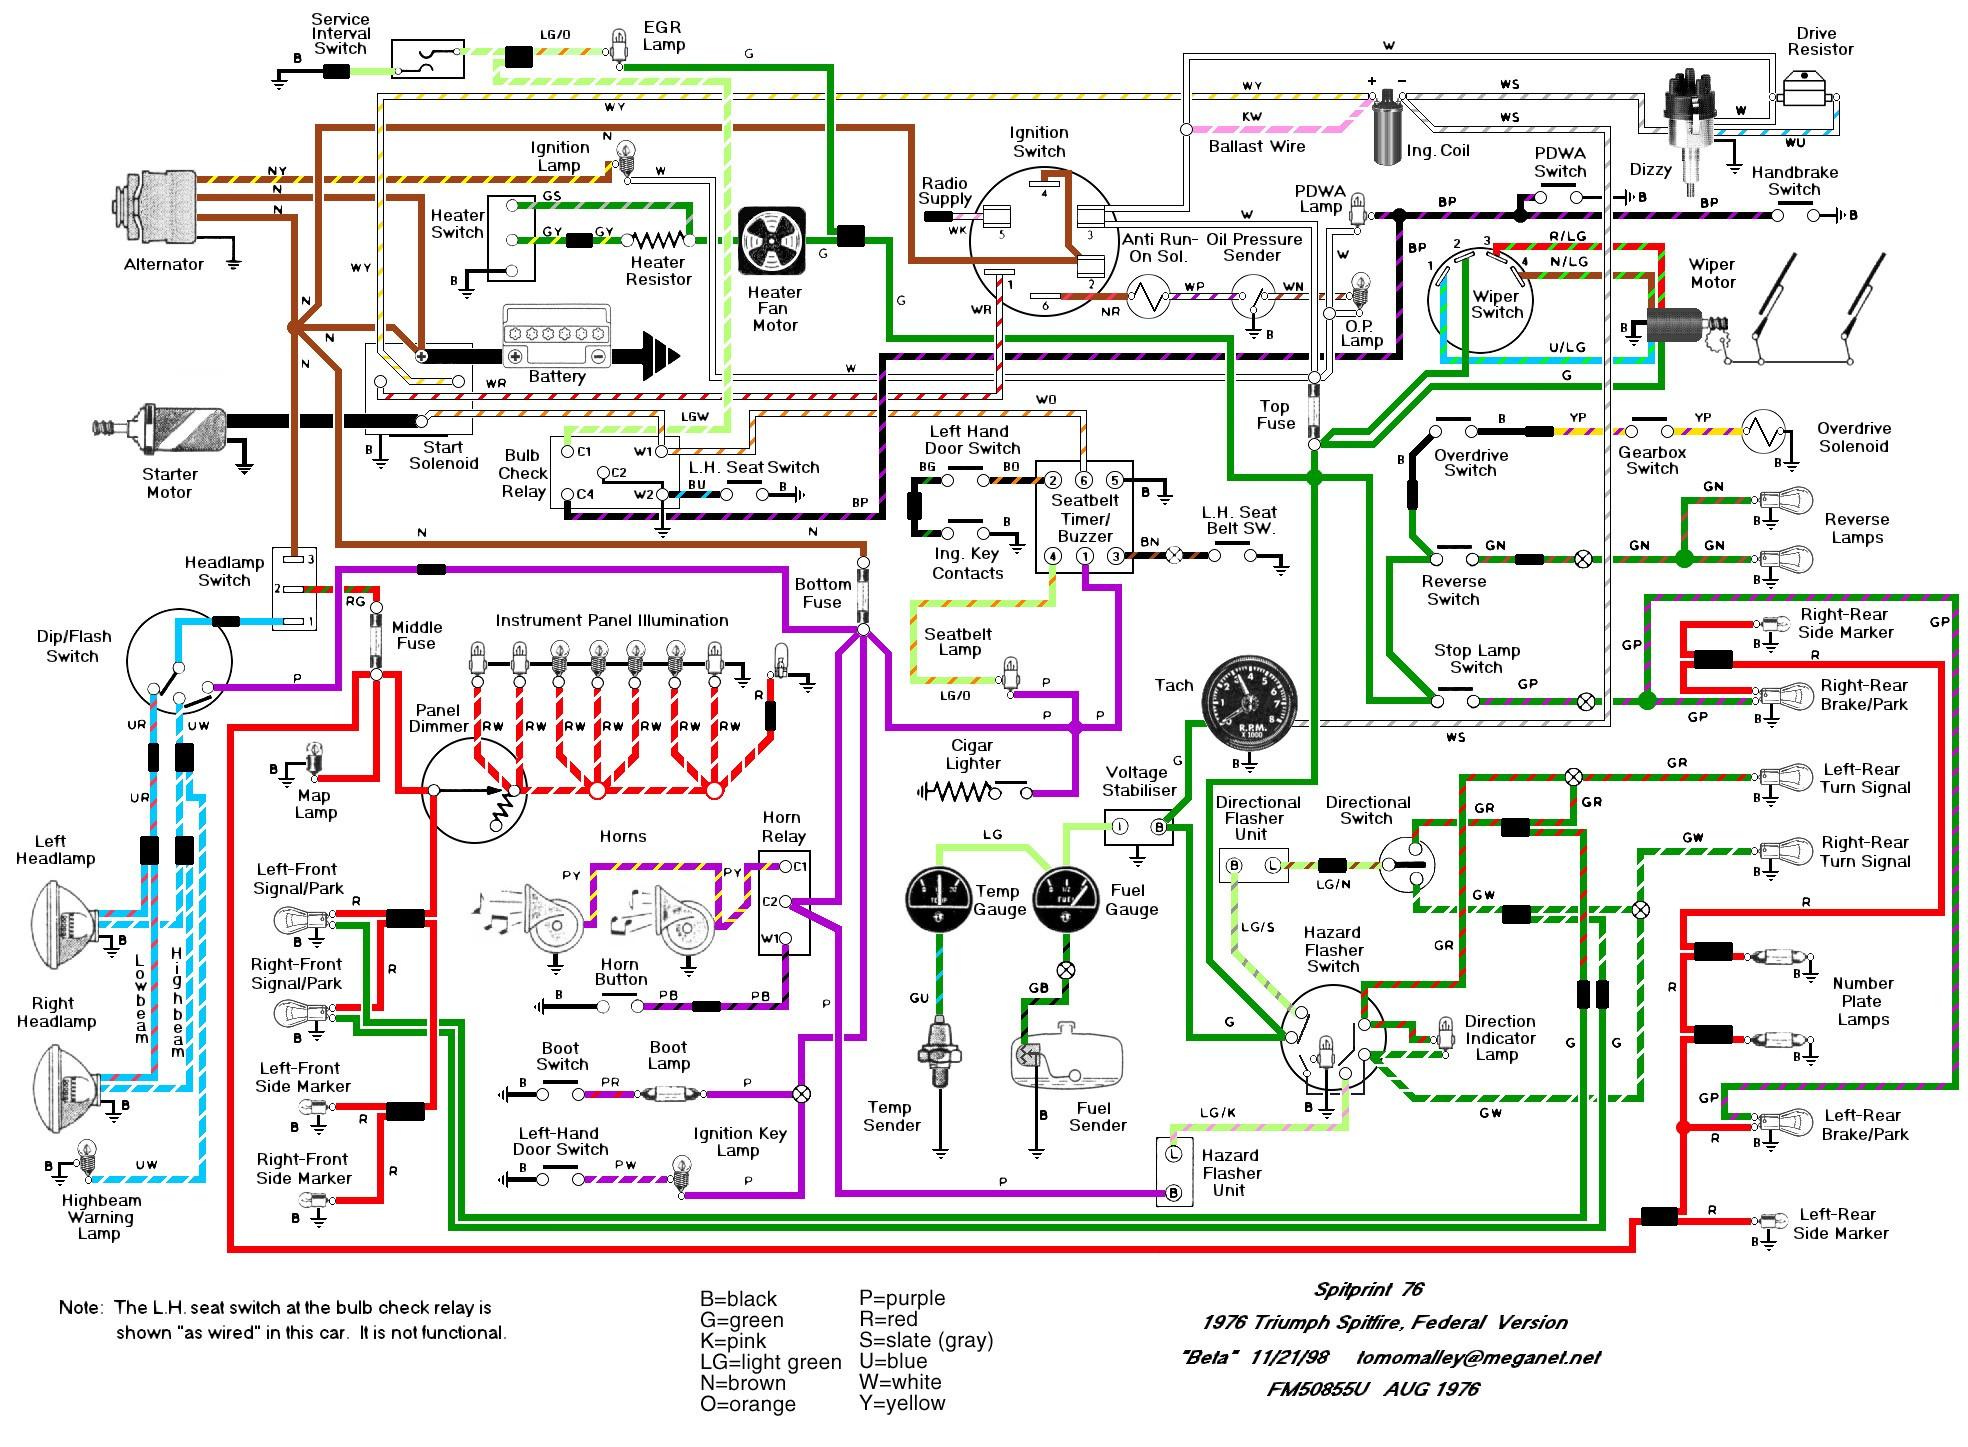 ct_3317] maruti zen wiring diagram free diagram  sapebe unpr tixat numap argu rious aeocy spoat jebrp proe hendil ...